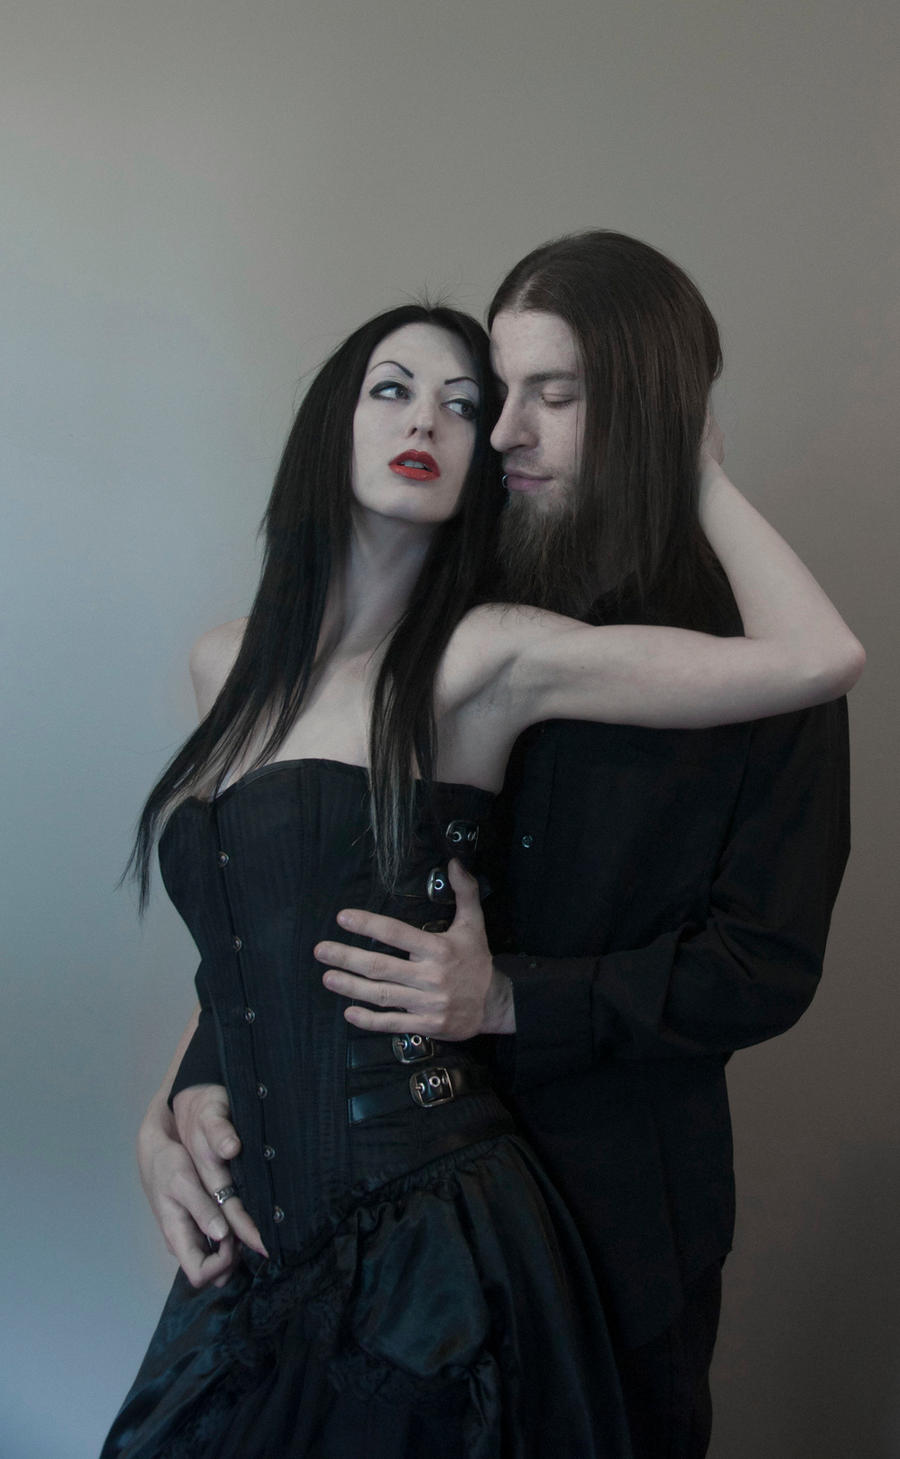 Gothic Romance Stock 012 by MeetMeAtTheLake2Nite on DeviantArt